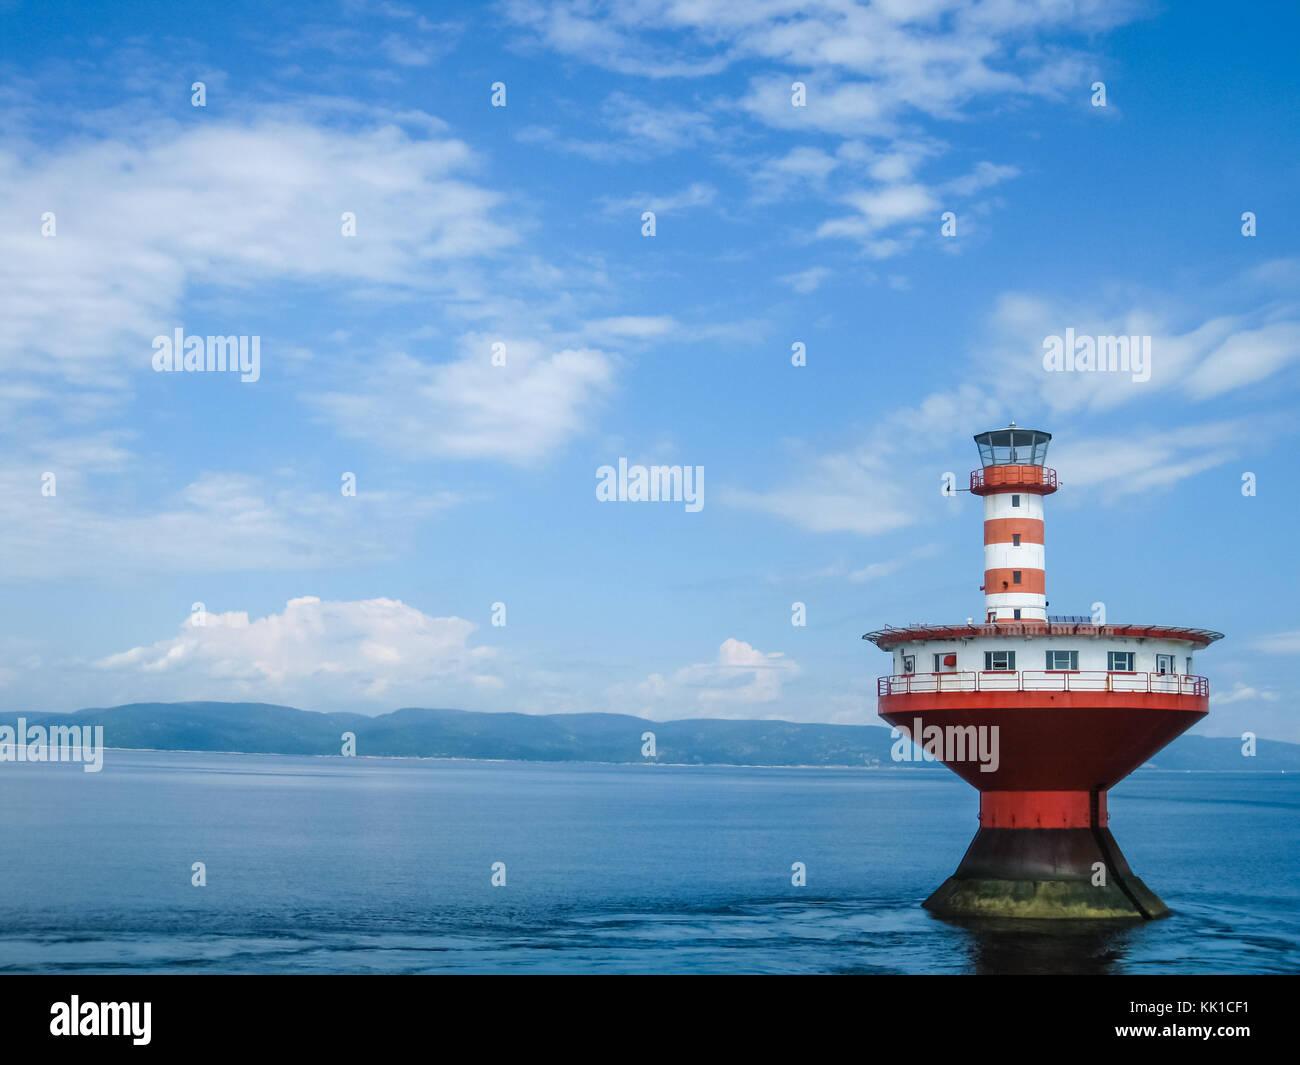 Haut-Fond Prince Lighthouse, Quebec, Canada - Stock Image